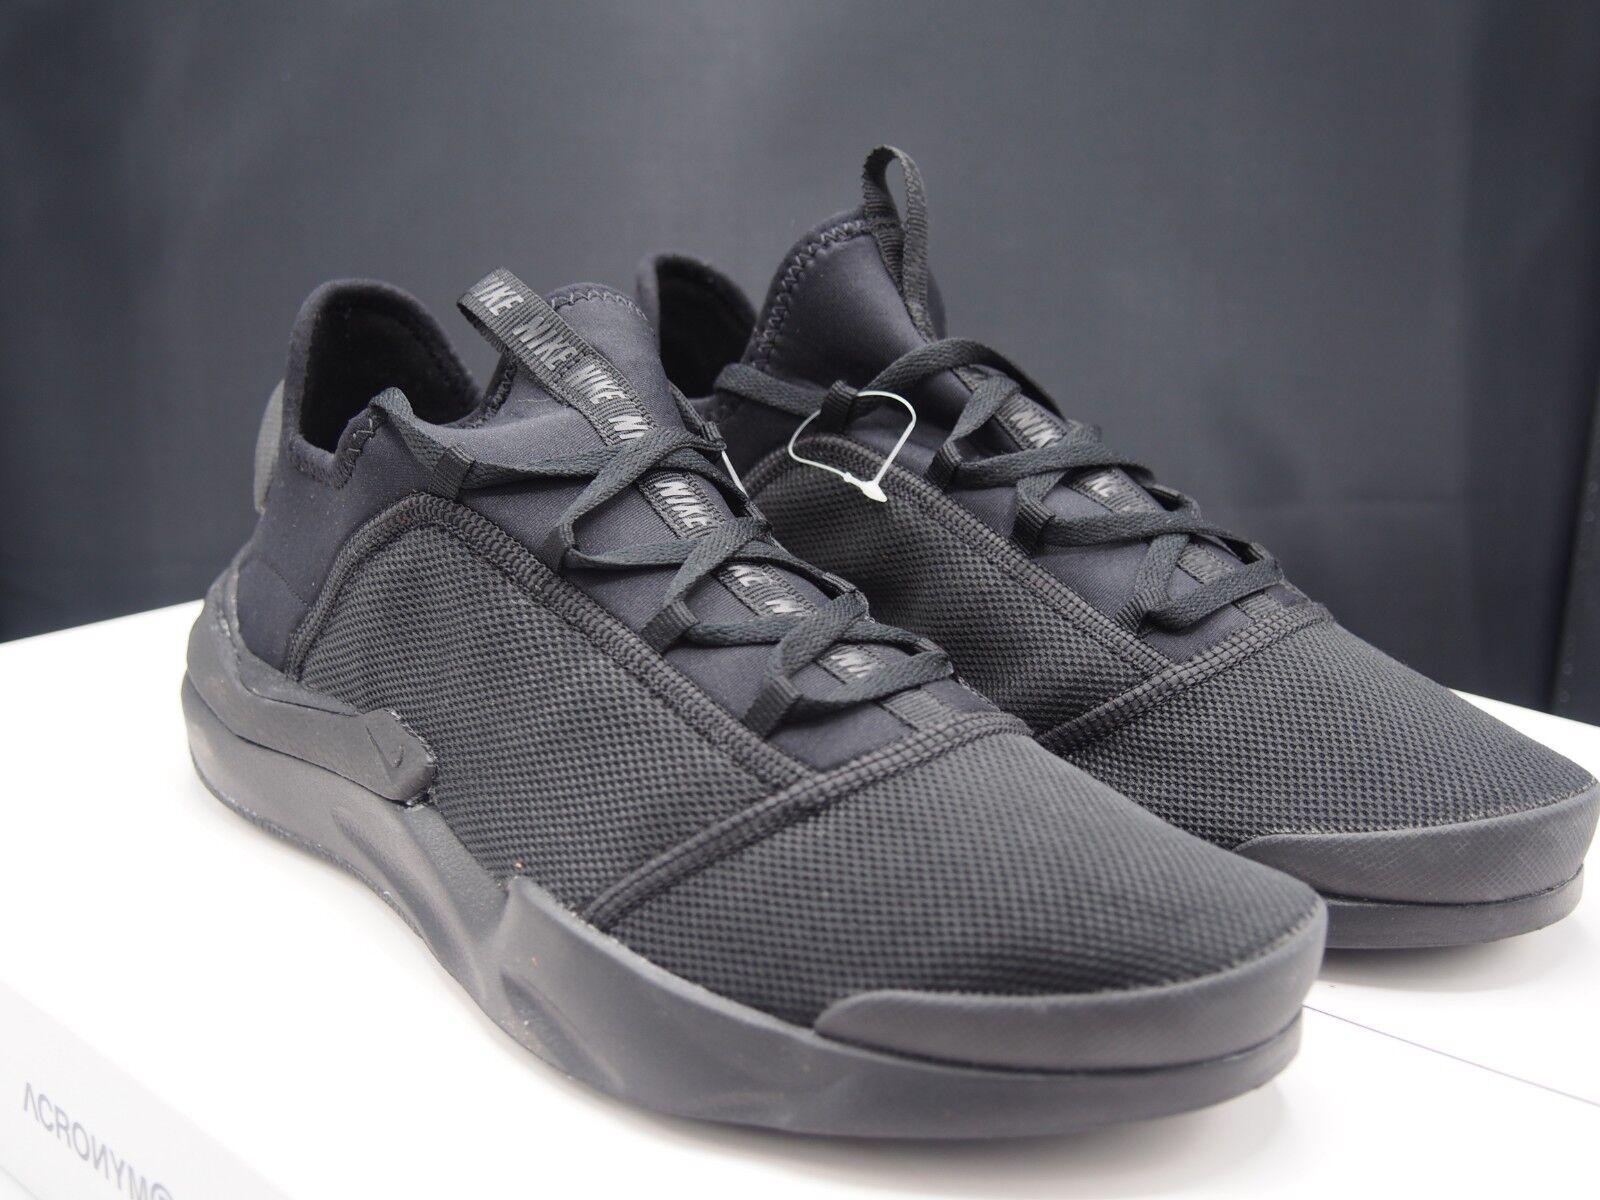 Nike Shift One Triple Black AO1733-003 Men's size 9 US